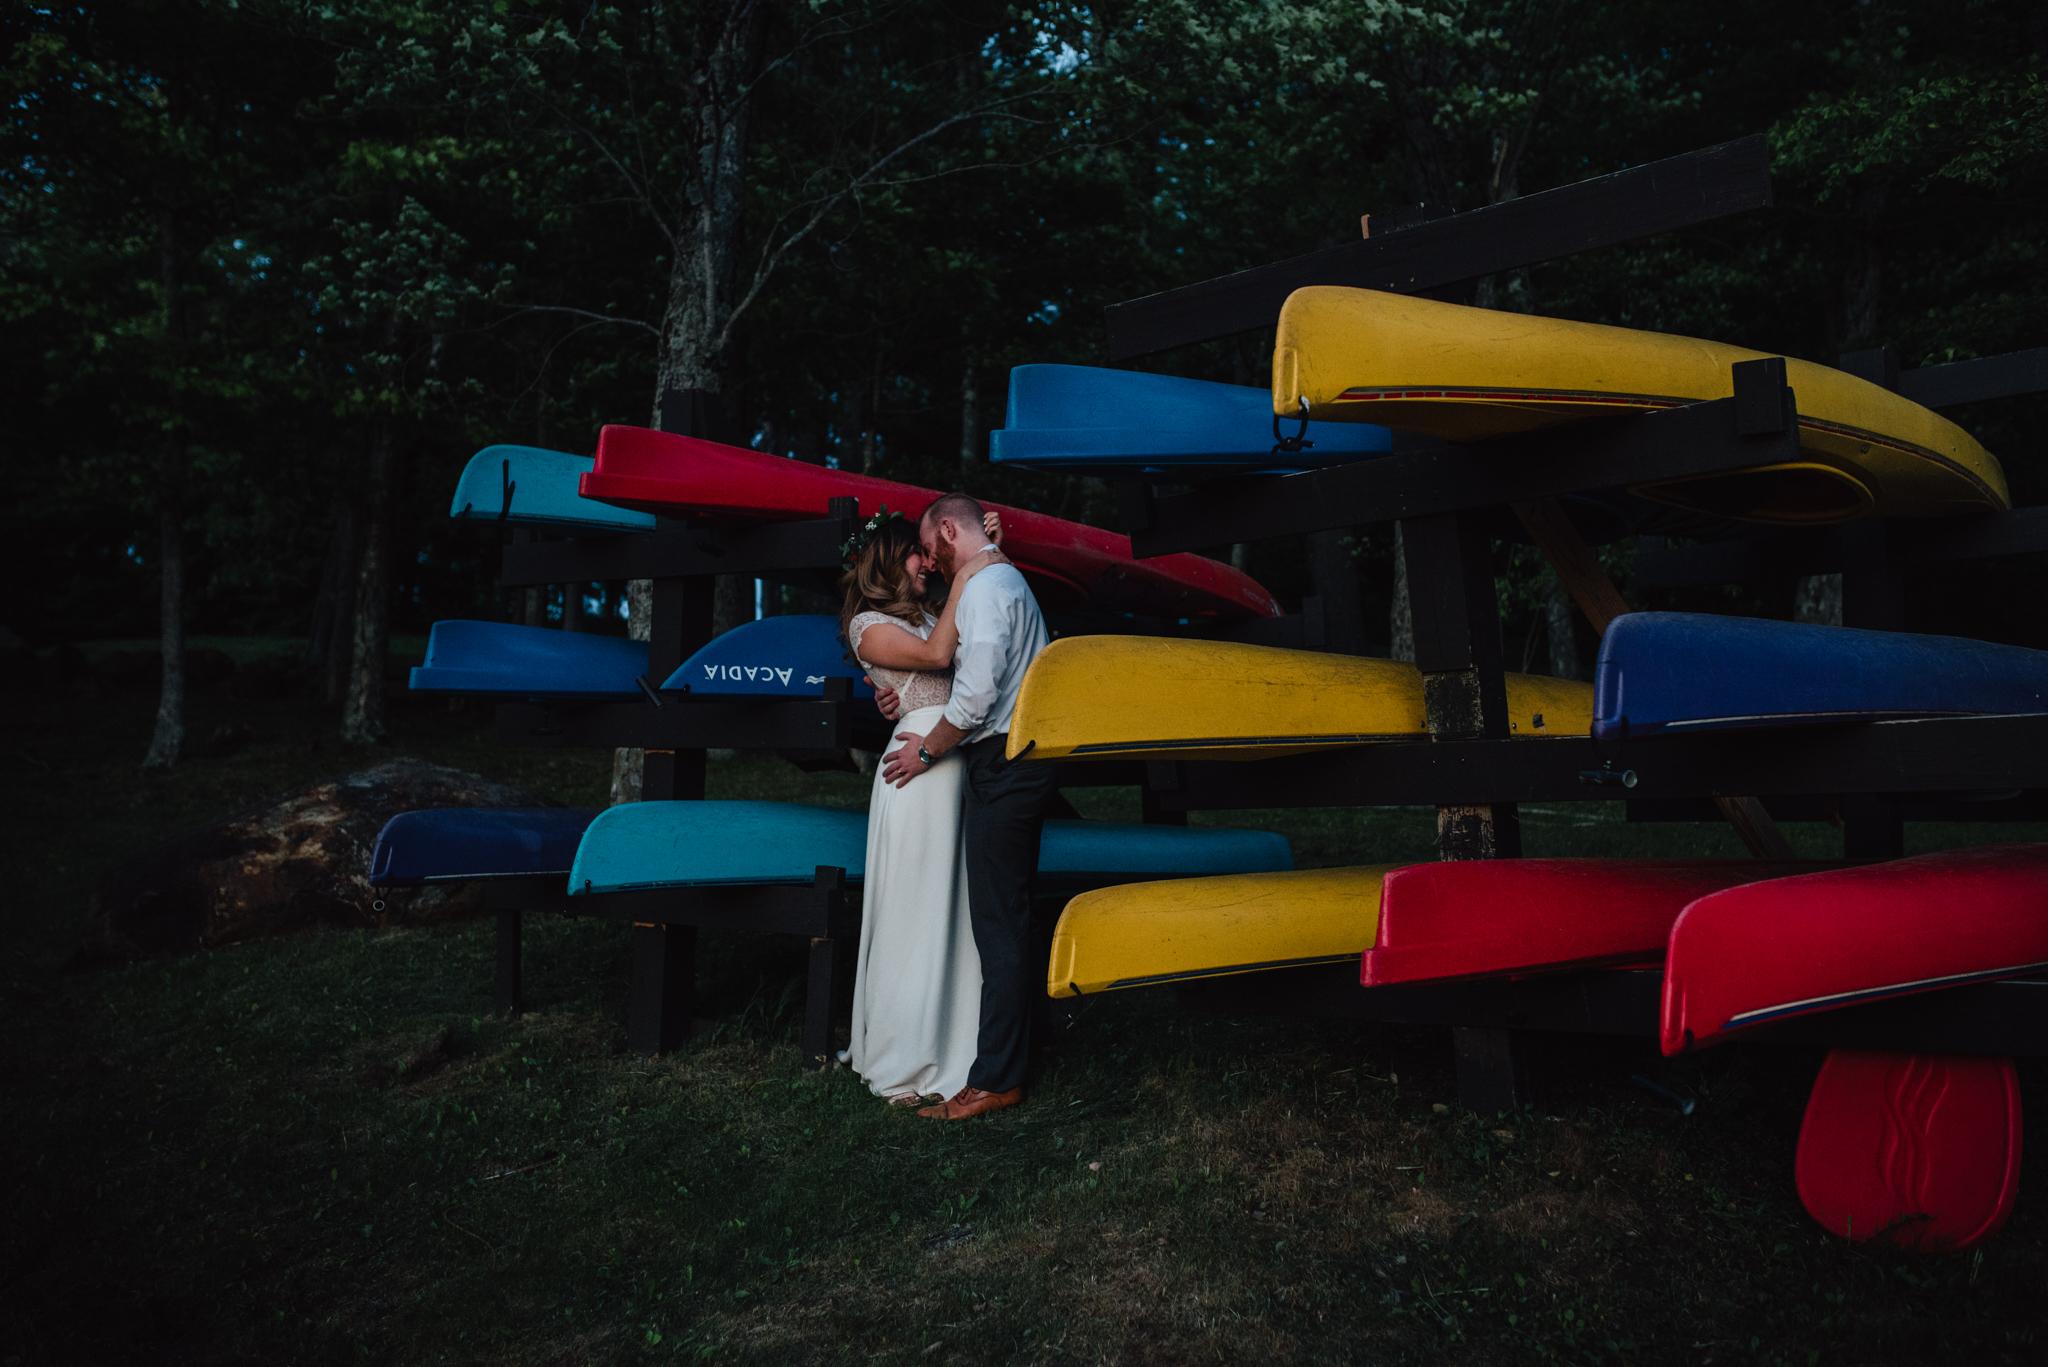 Summer Camp Wedding Photography June 2017 Massachusetts Berkshires Outdoor Wedding Photography Novella Photography Matt and Paulette Griswold (183).jpg